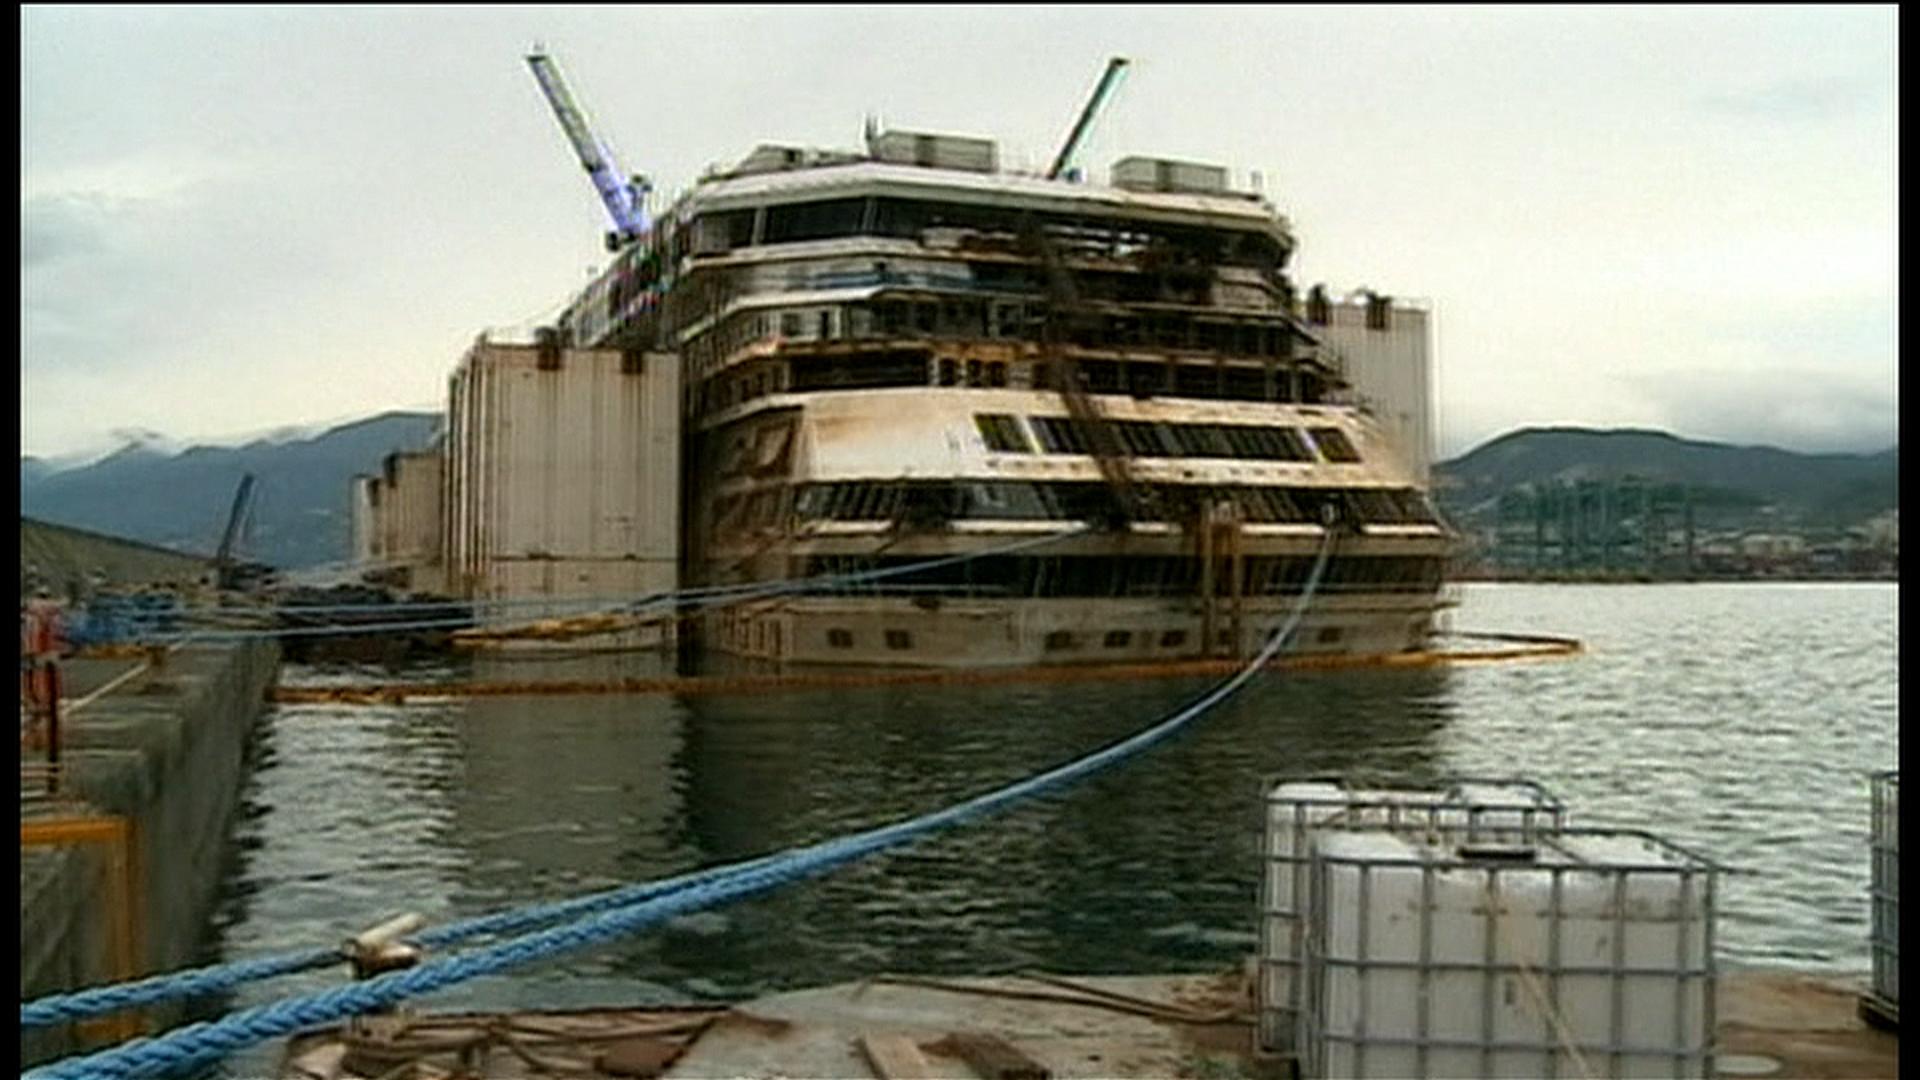 Crews Work To Dismantle The Costa Concordia Nbc News